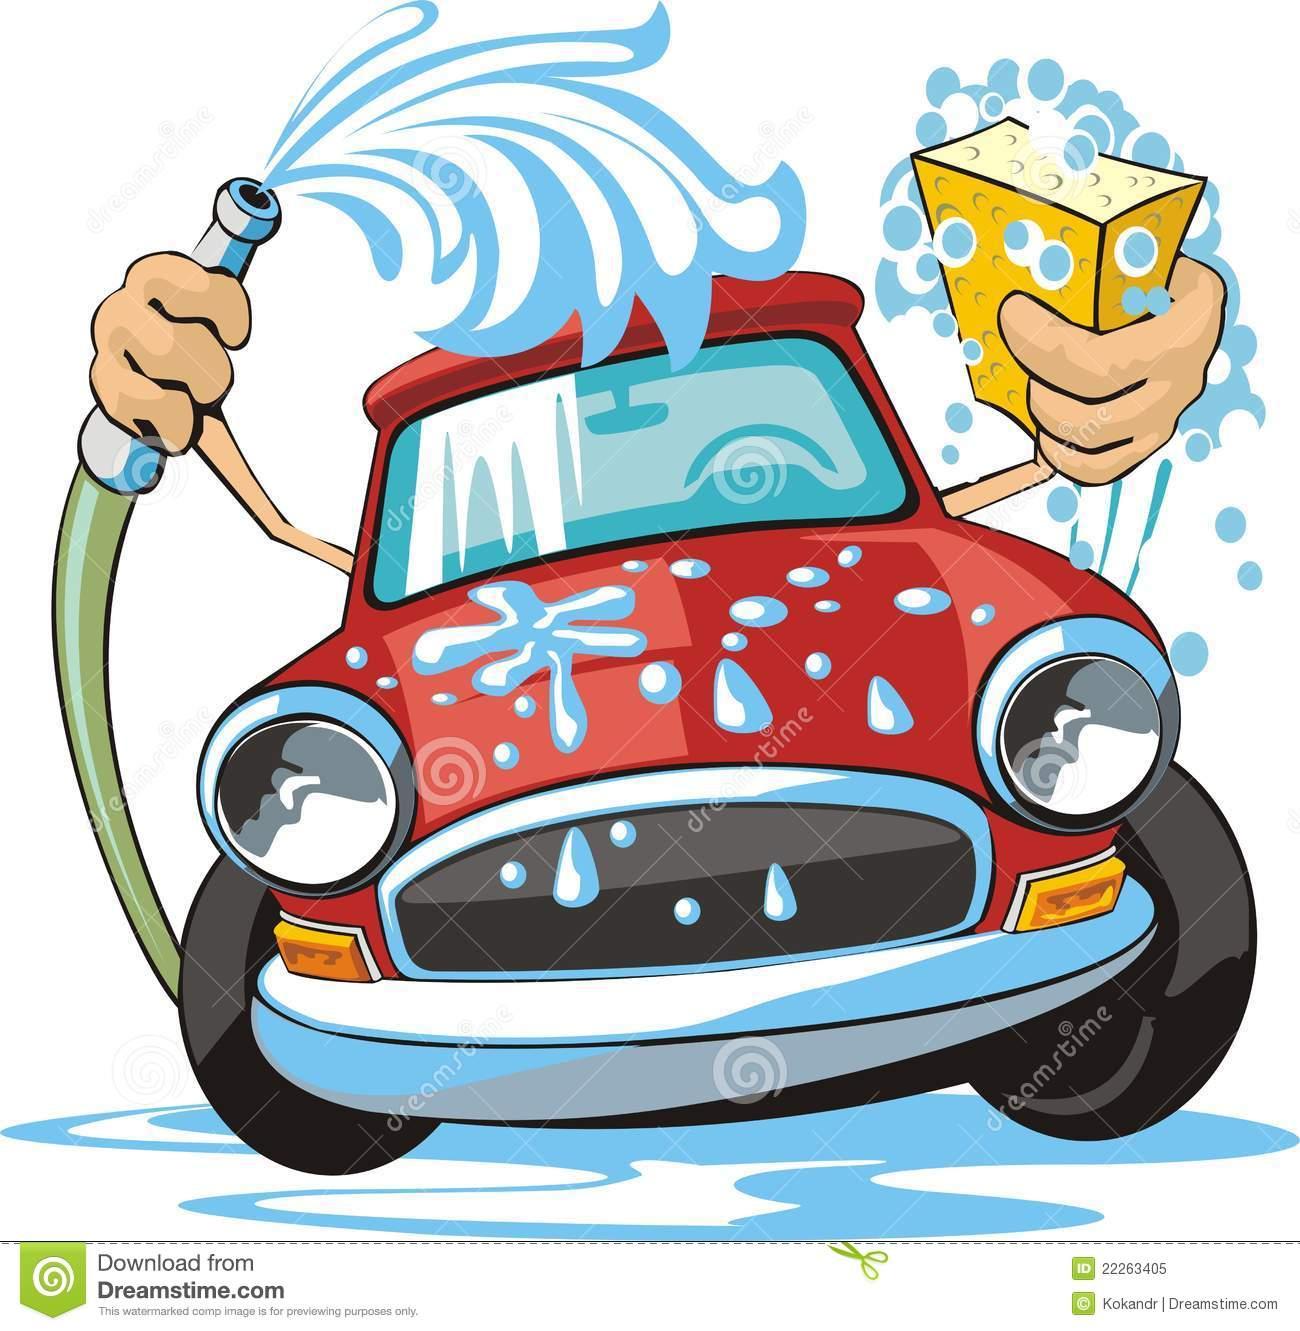 Car wash logos clip art.